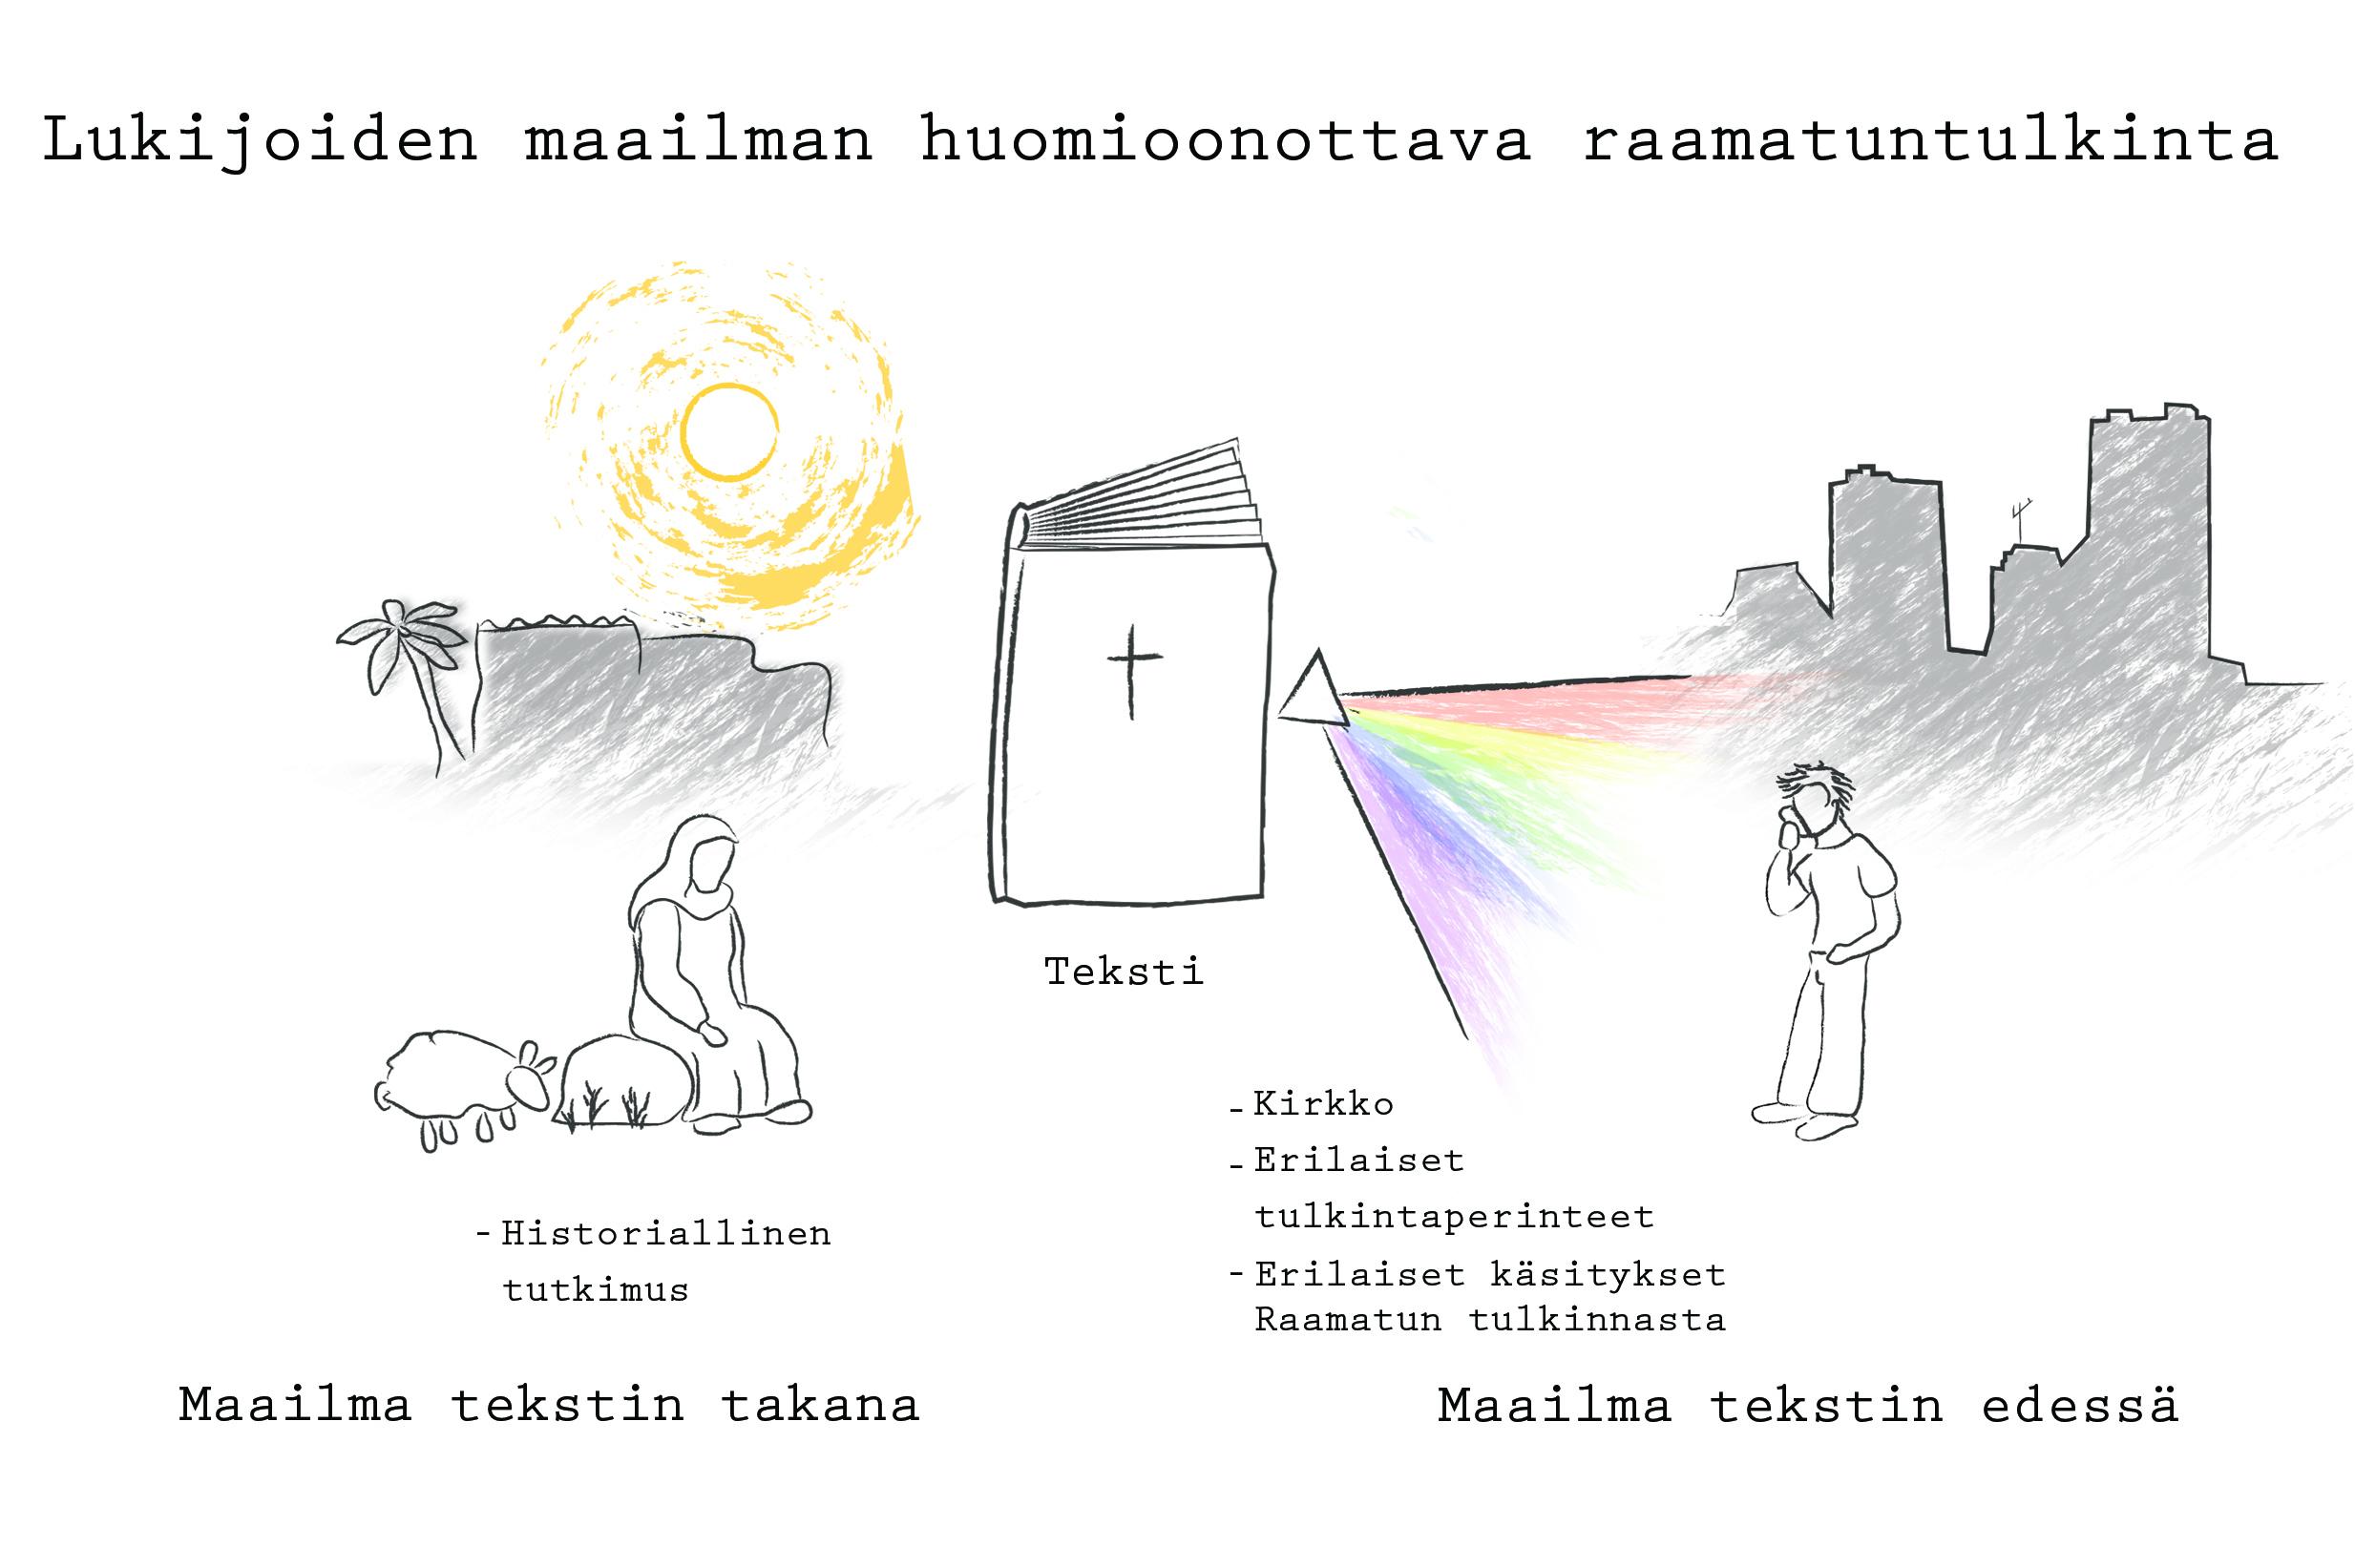 Raamatuntulkinta_Final